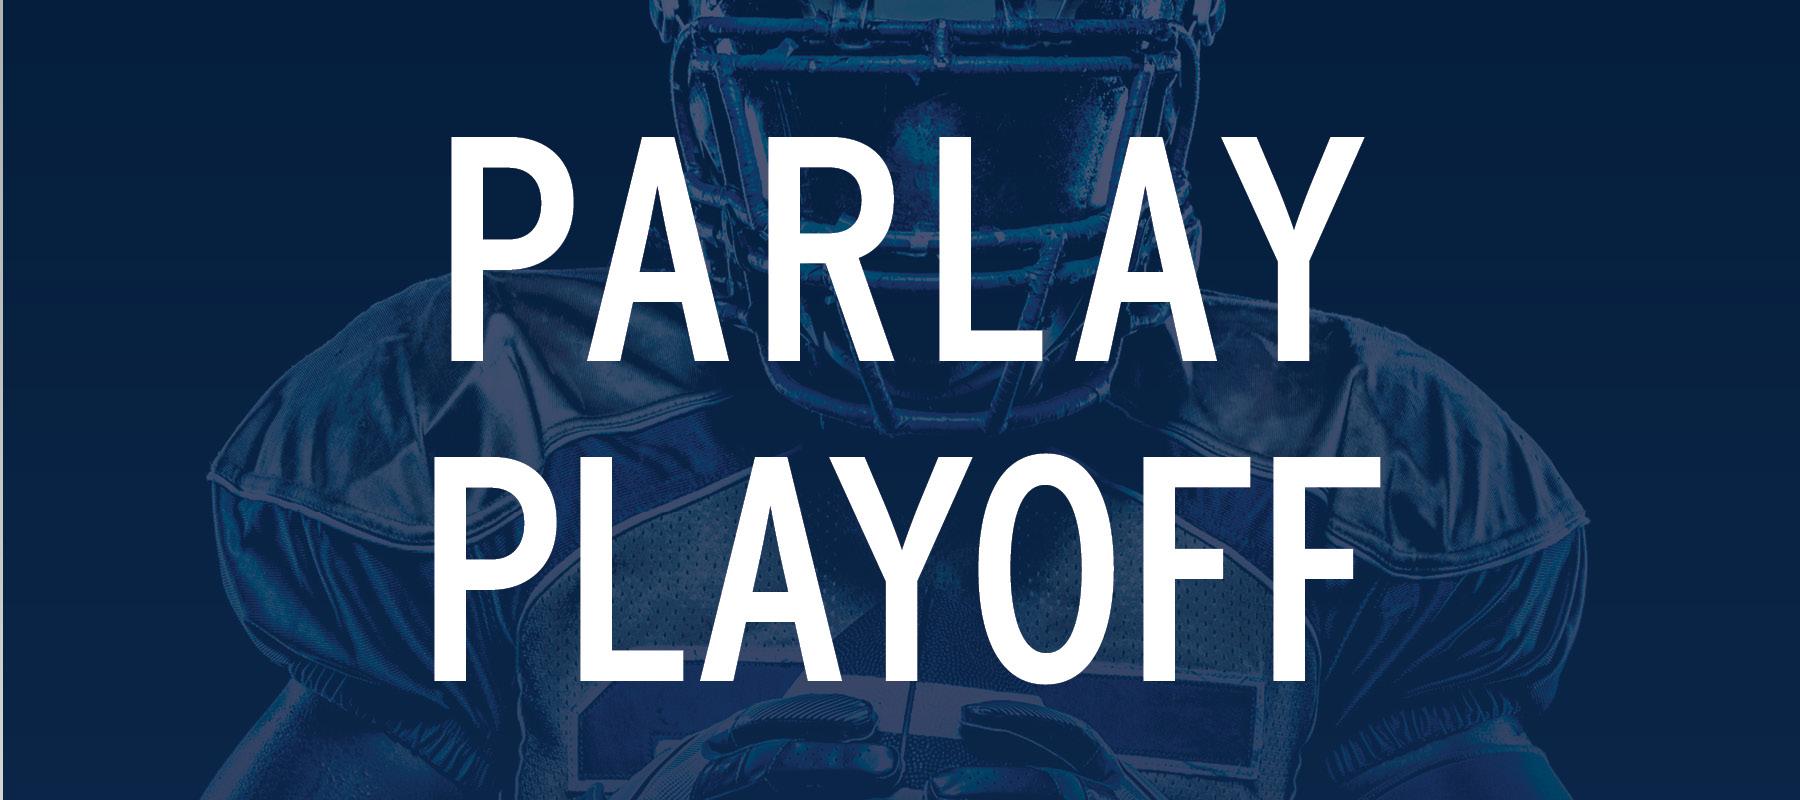 Parlay Playoff